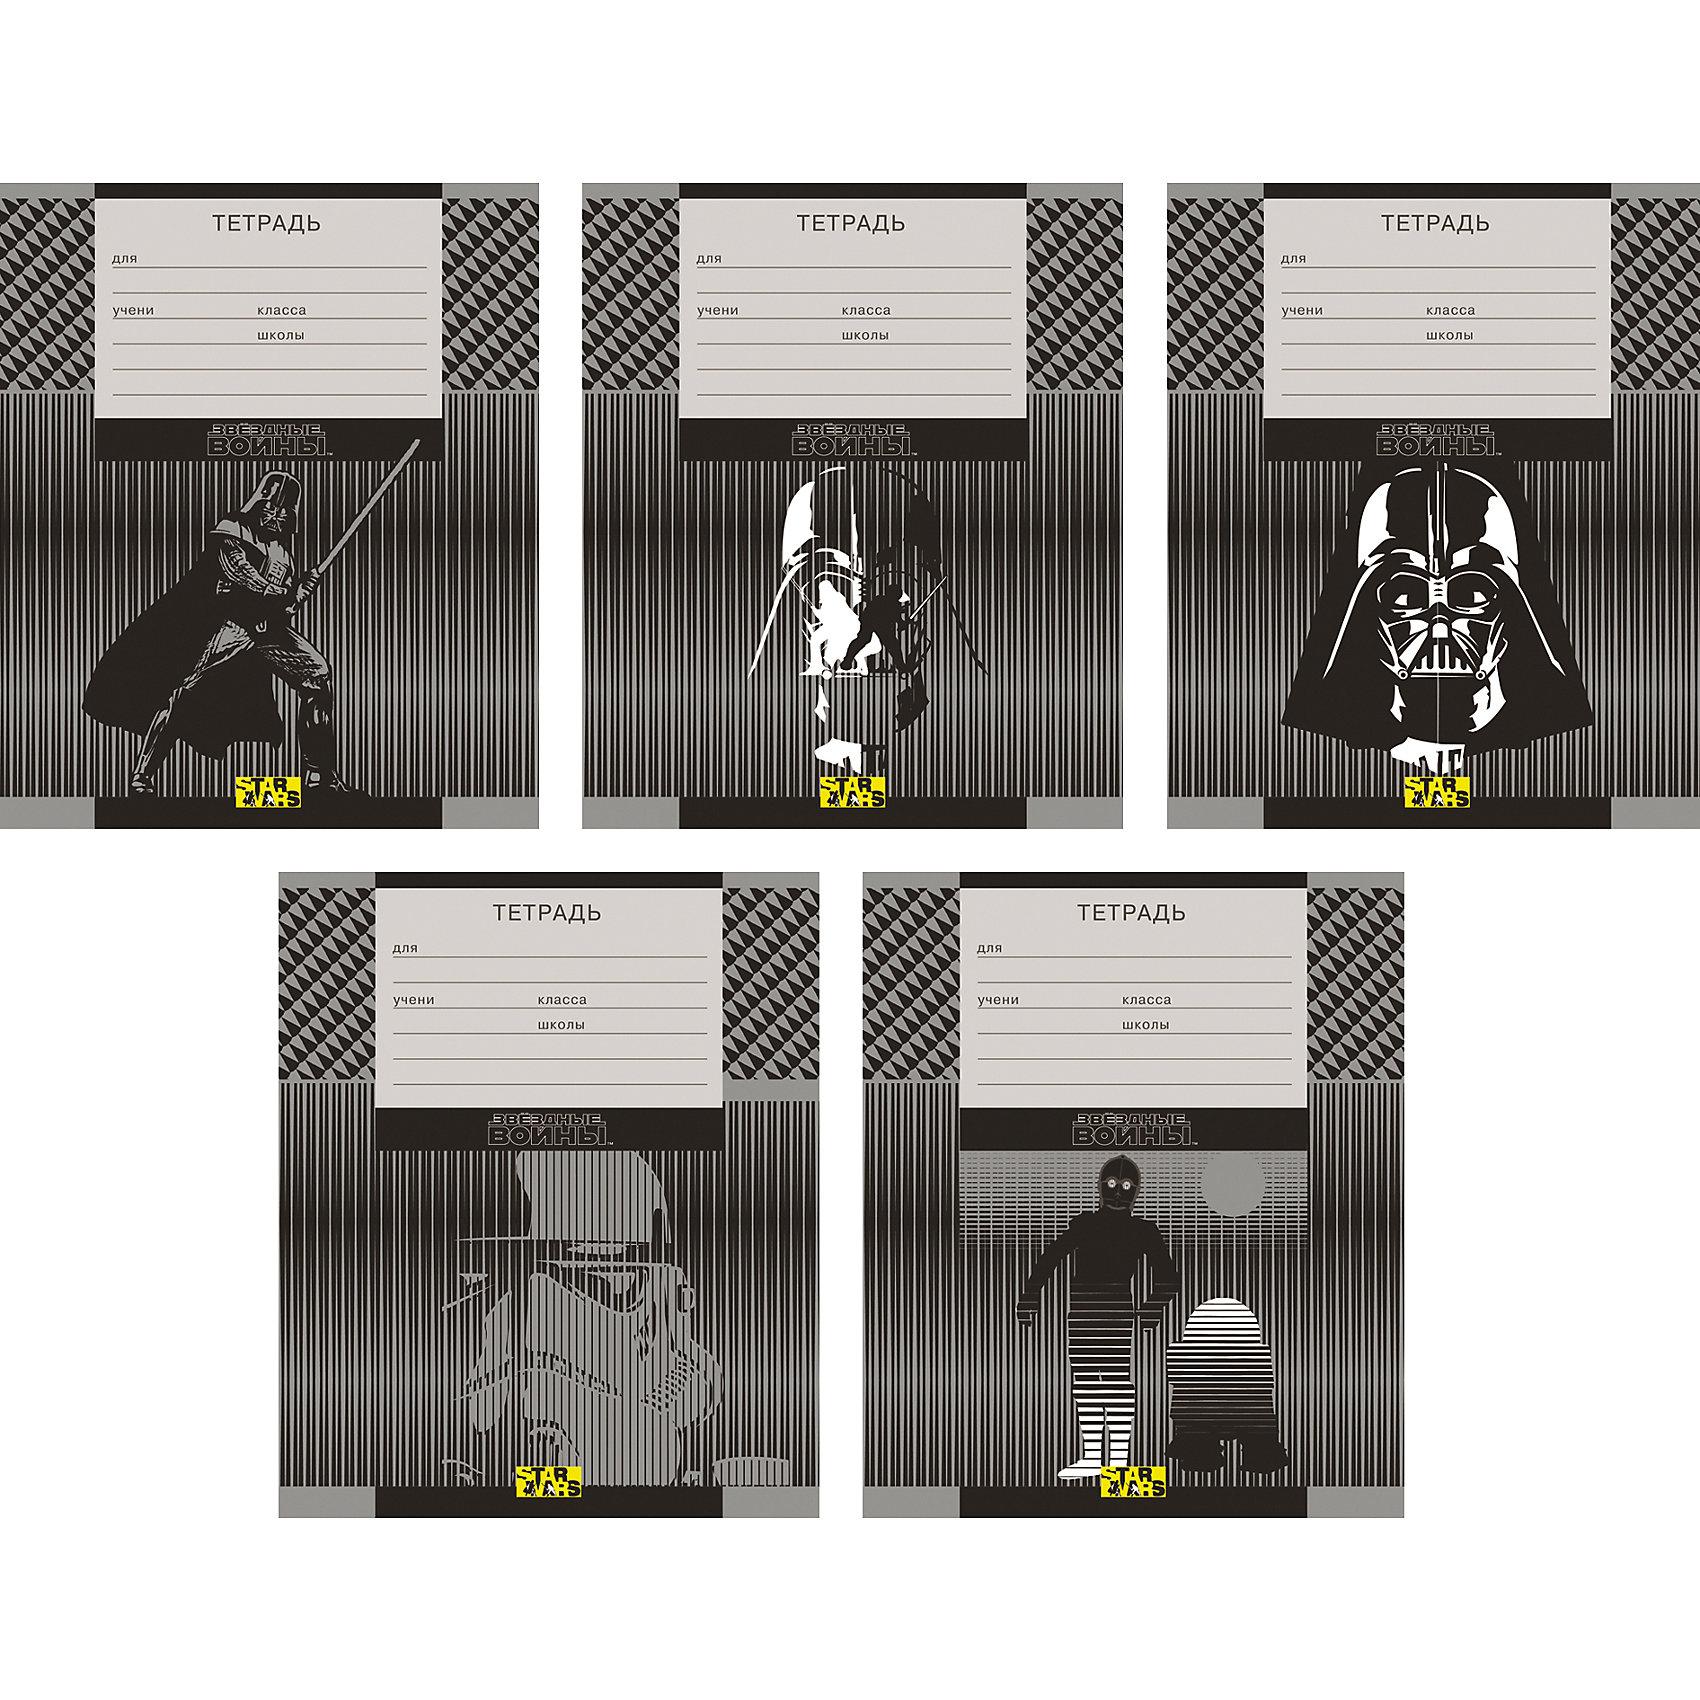 ErichKrause Альбом для рисования Дарт Вейдер, А4, 40 л. рюкзак детский erichkrause erichkrause школьный рюкзак city explorer